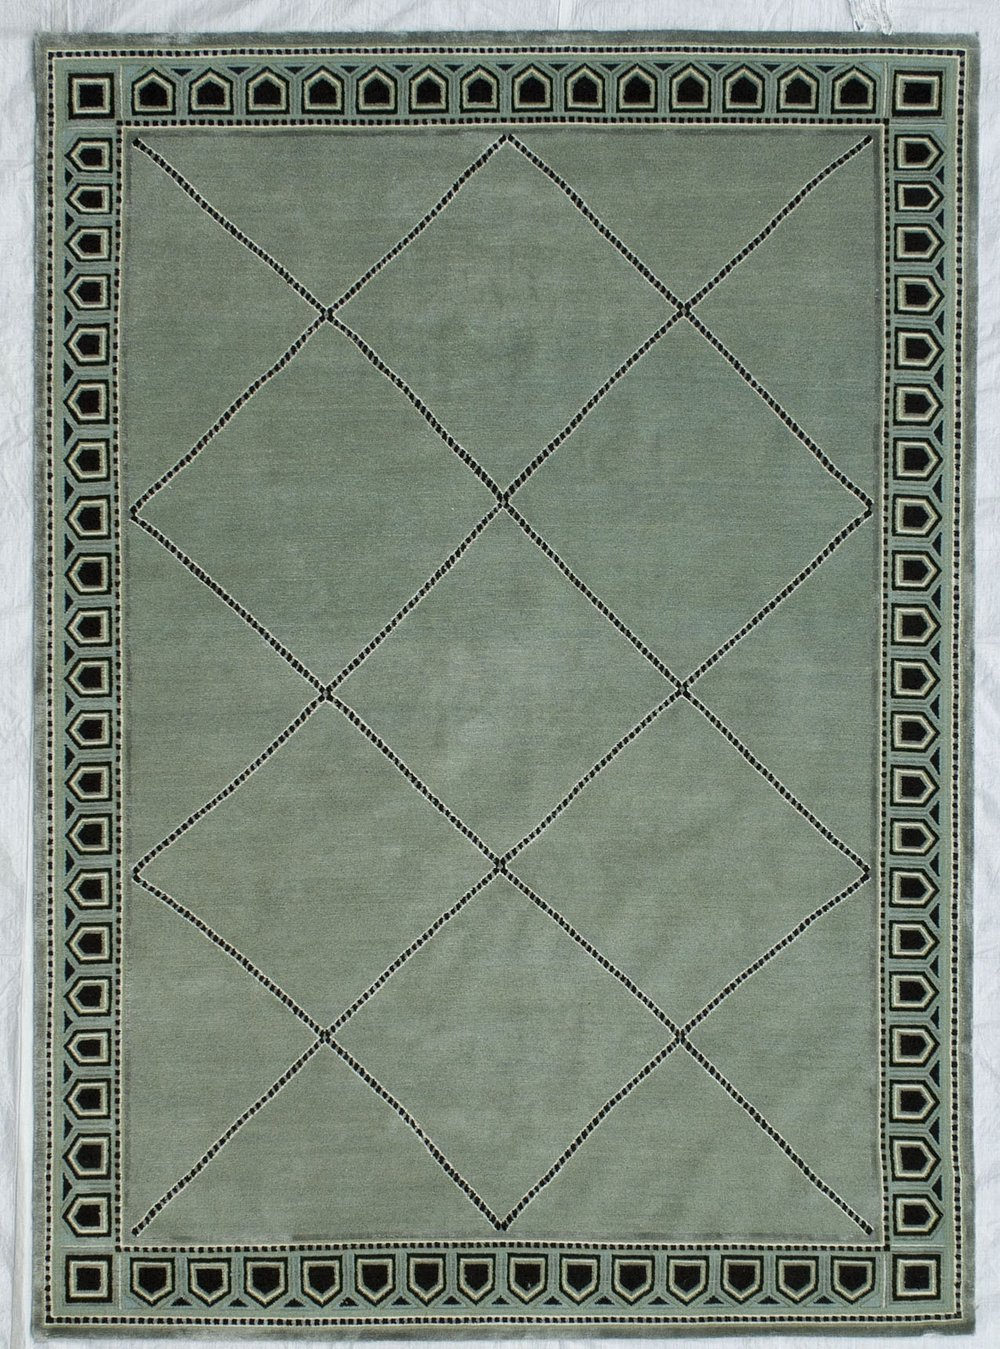 STA-L-609488 (Modern Trellis) 6-58 x 9.jpg